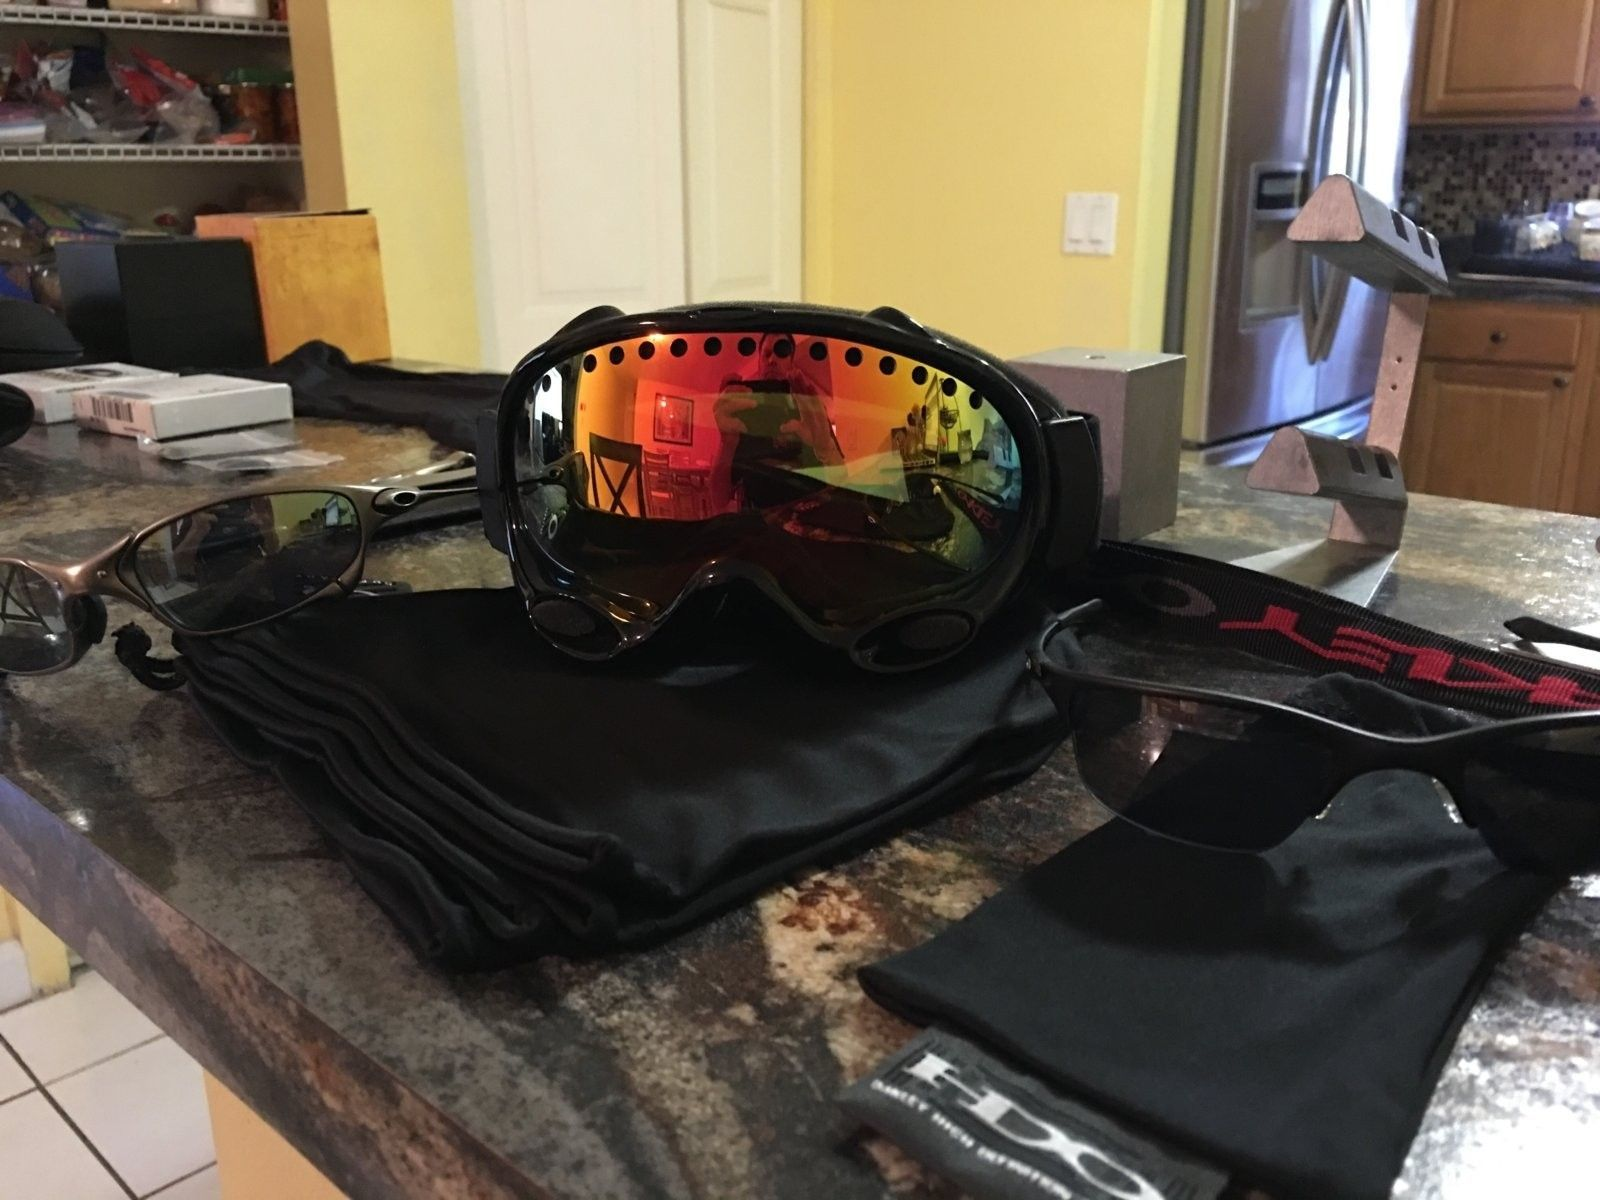 Help identifying goggles - image.jpg